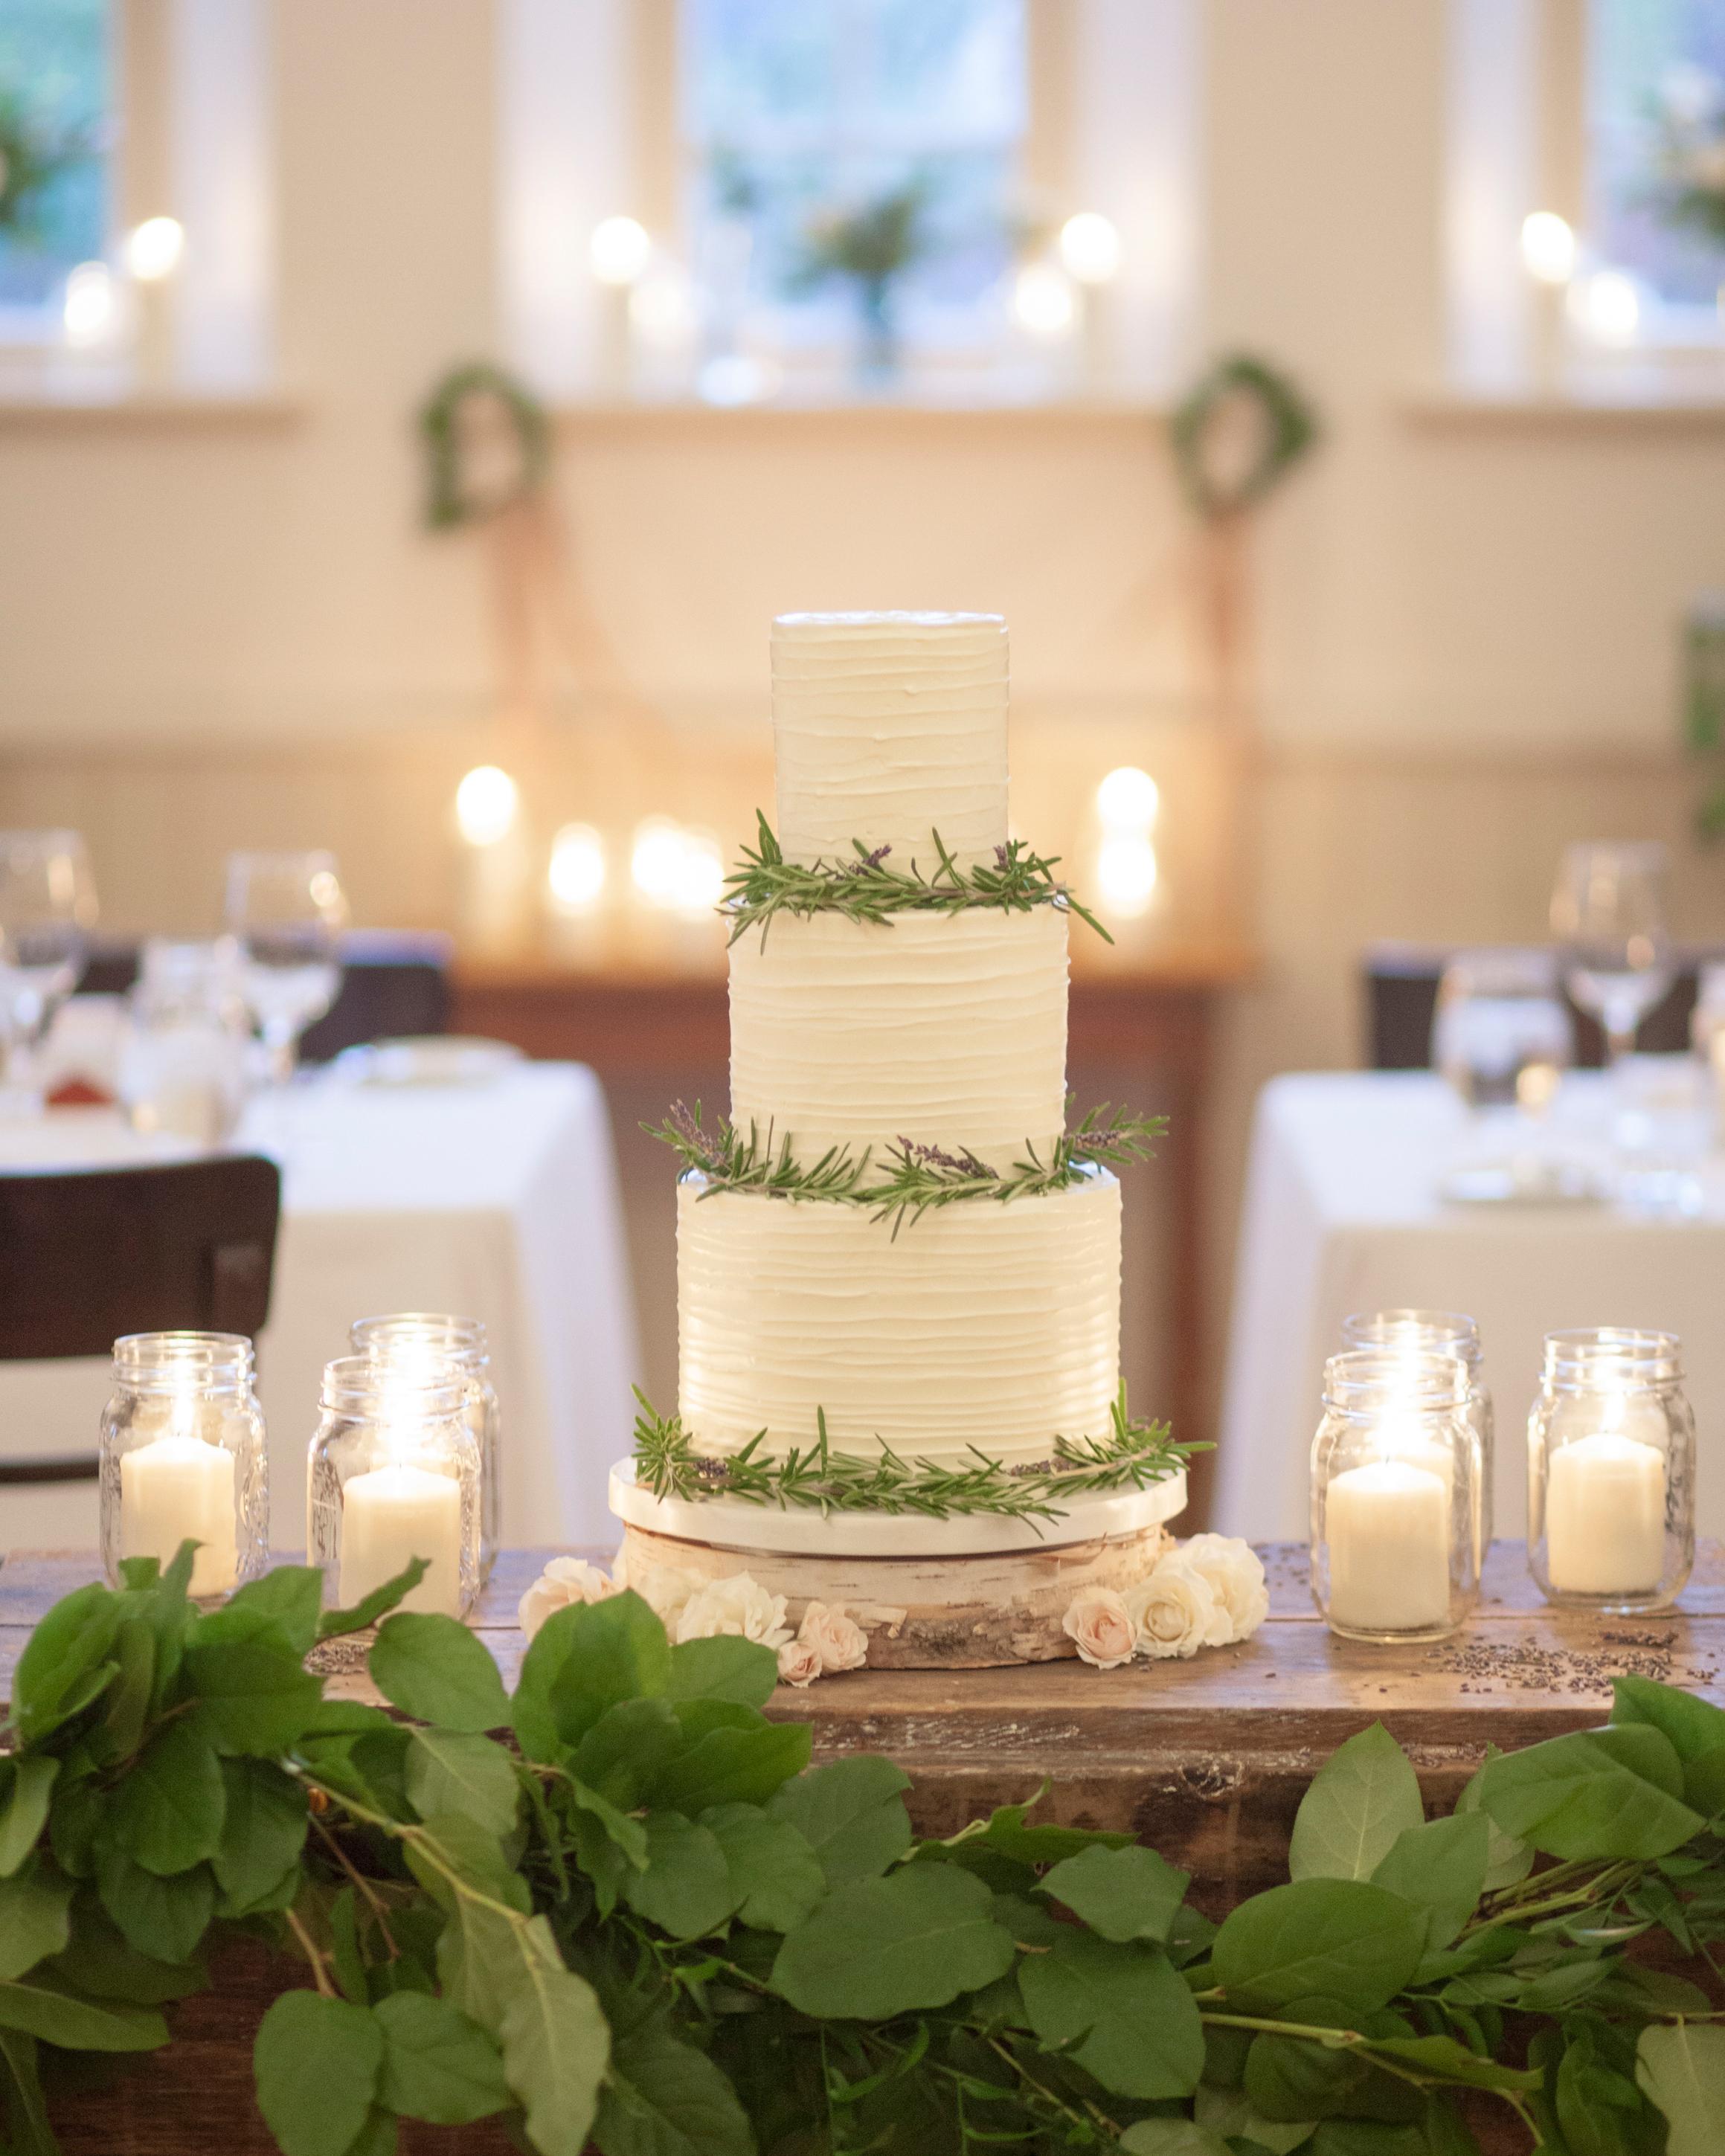 trish-alan-wedding-cake-075-s111348-0714.jpg